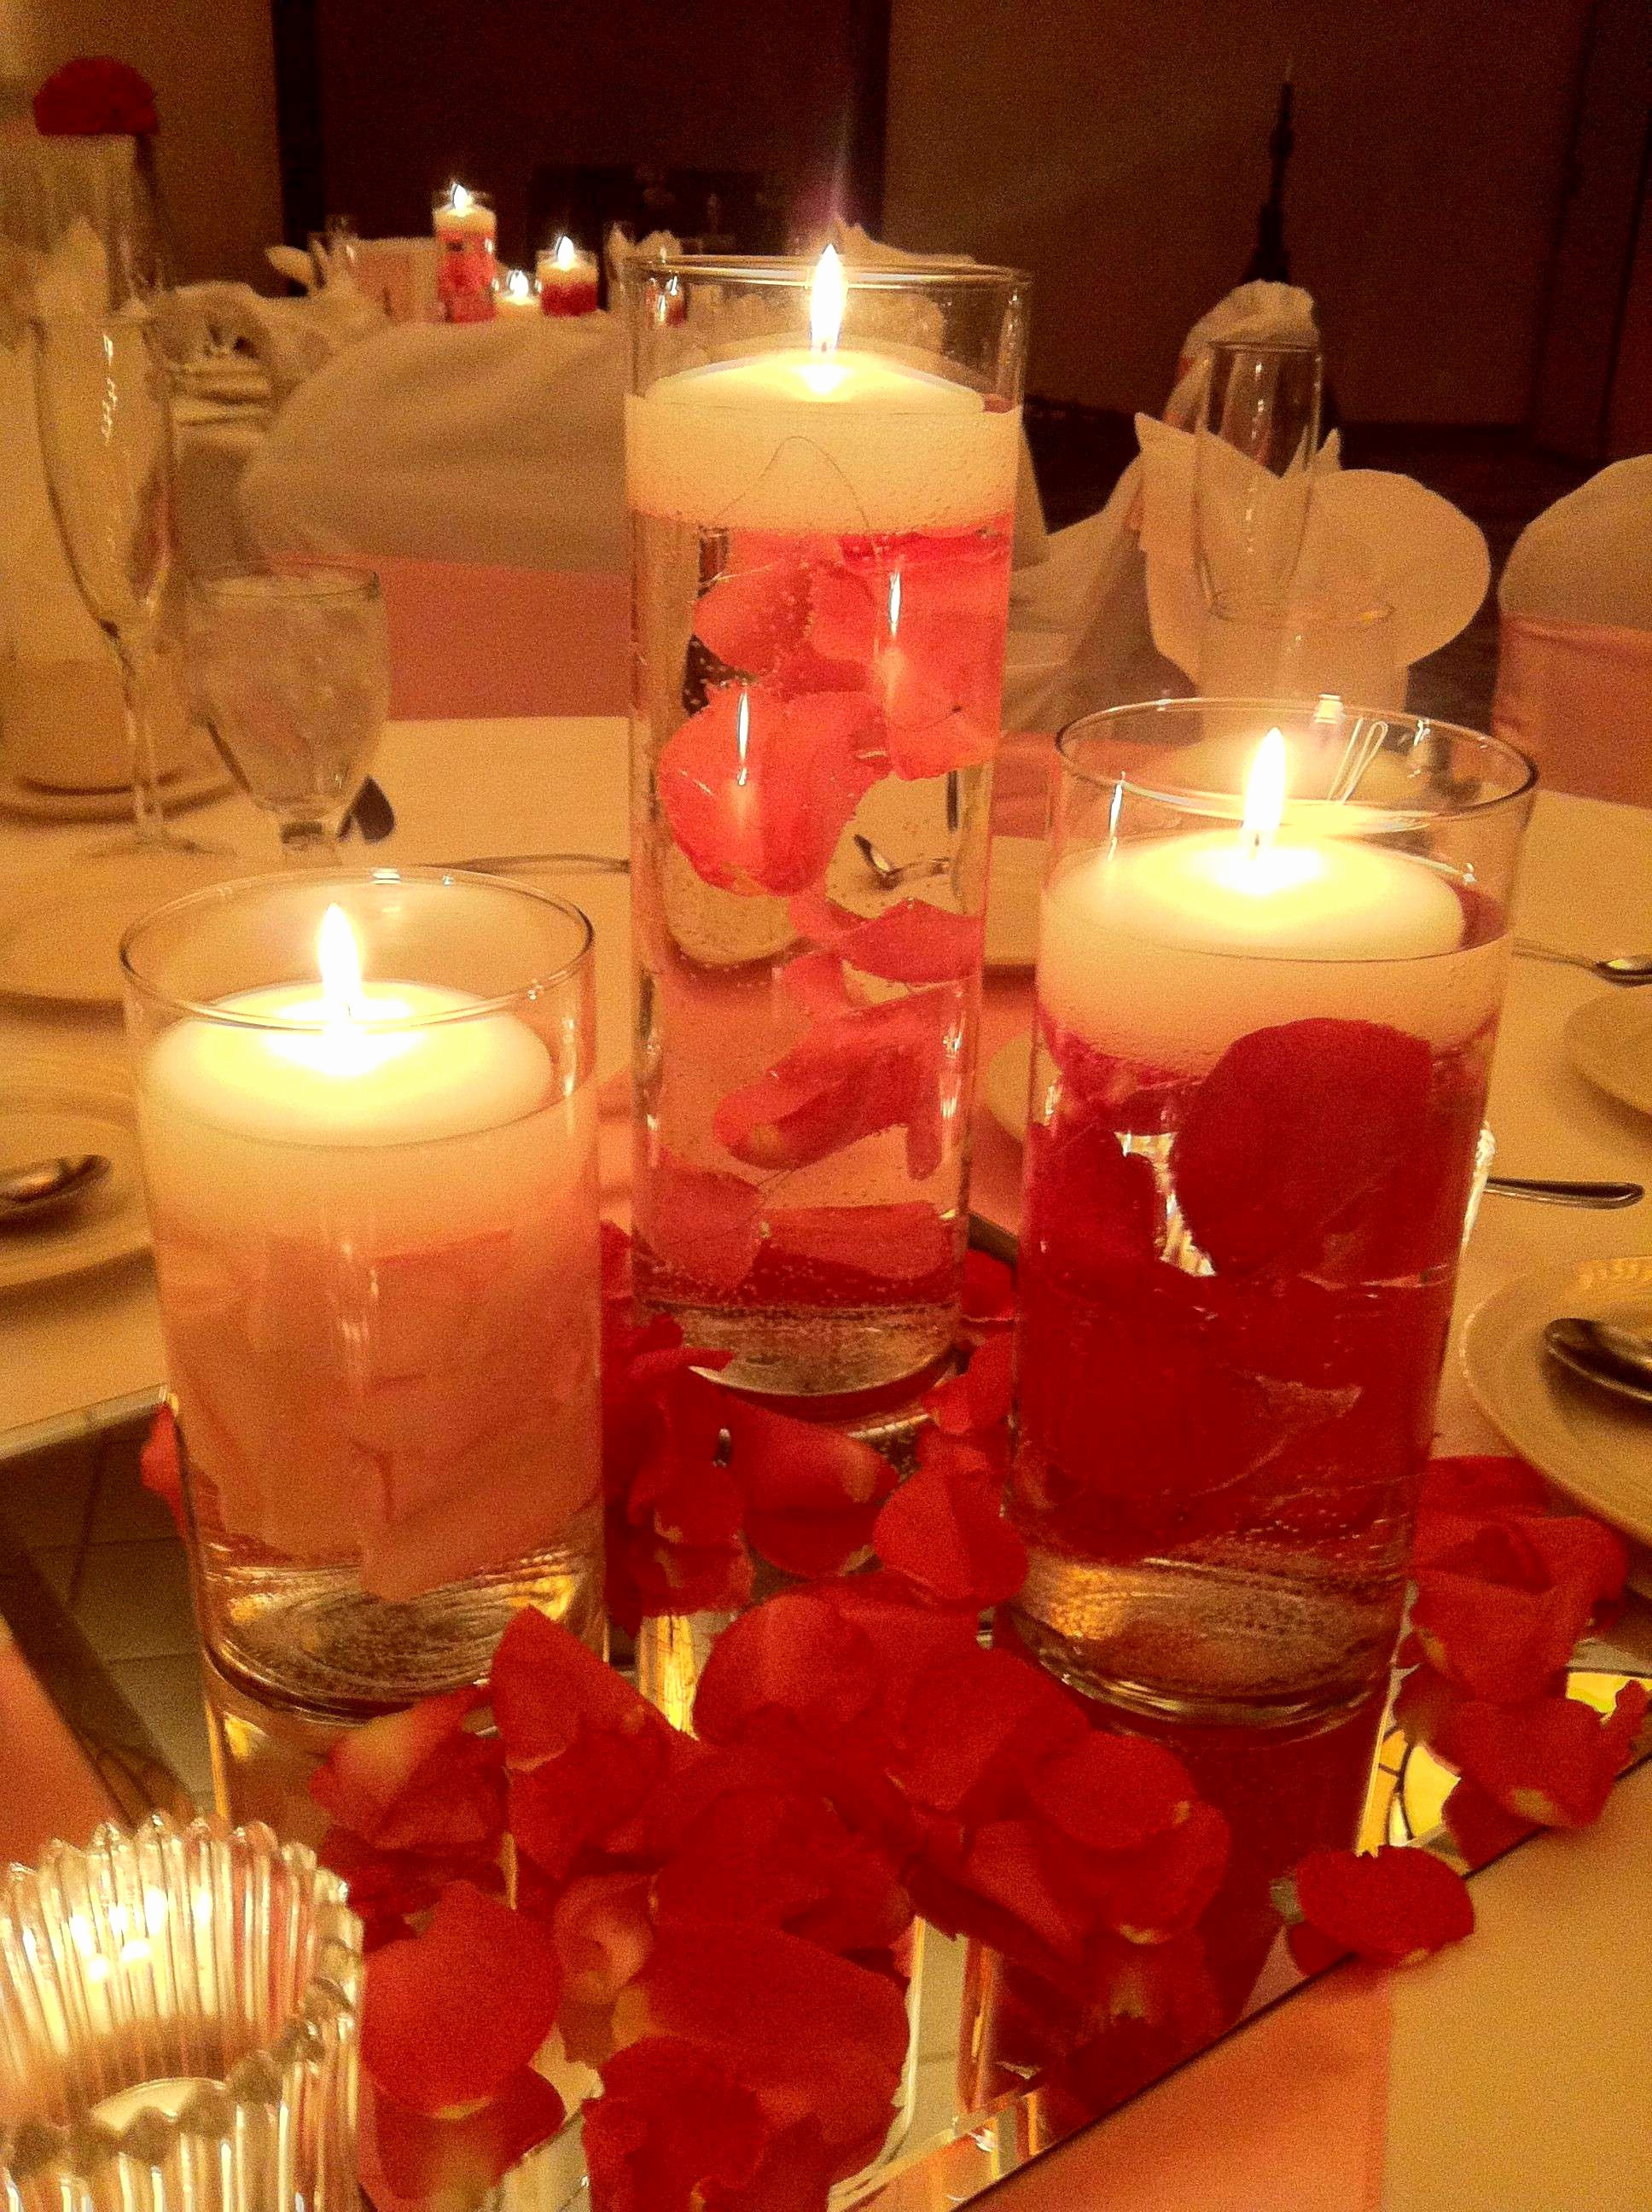 Clear Plastic Cylinder Vases wholesale Of 19 Elegant Glass Cylinder Vases Dollar Tree Bogekompresorturkiye Com with Regard to Gallery Things Needed for A Wedding New Dollar Tree Wedding Decorations Awesome H Vases Dollar Vase